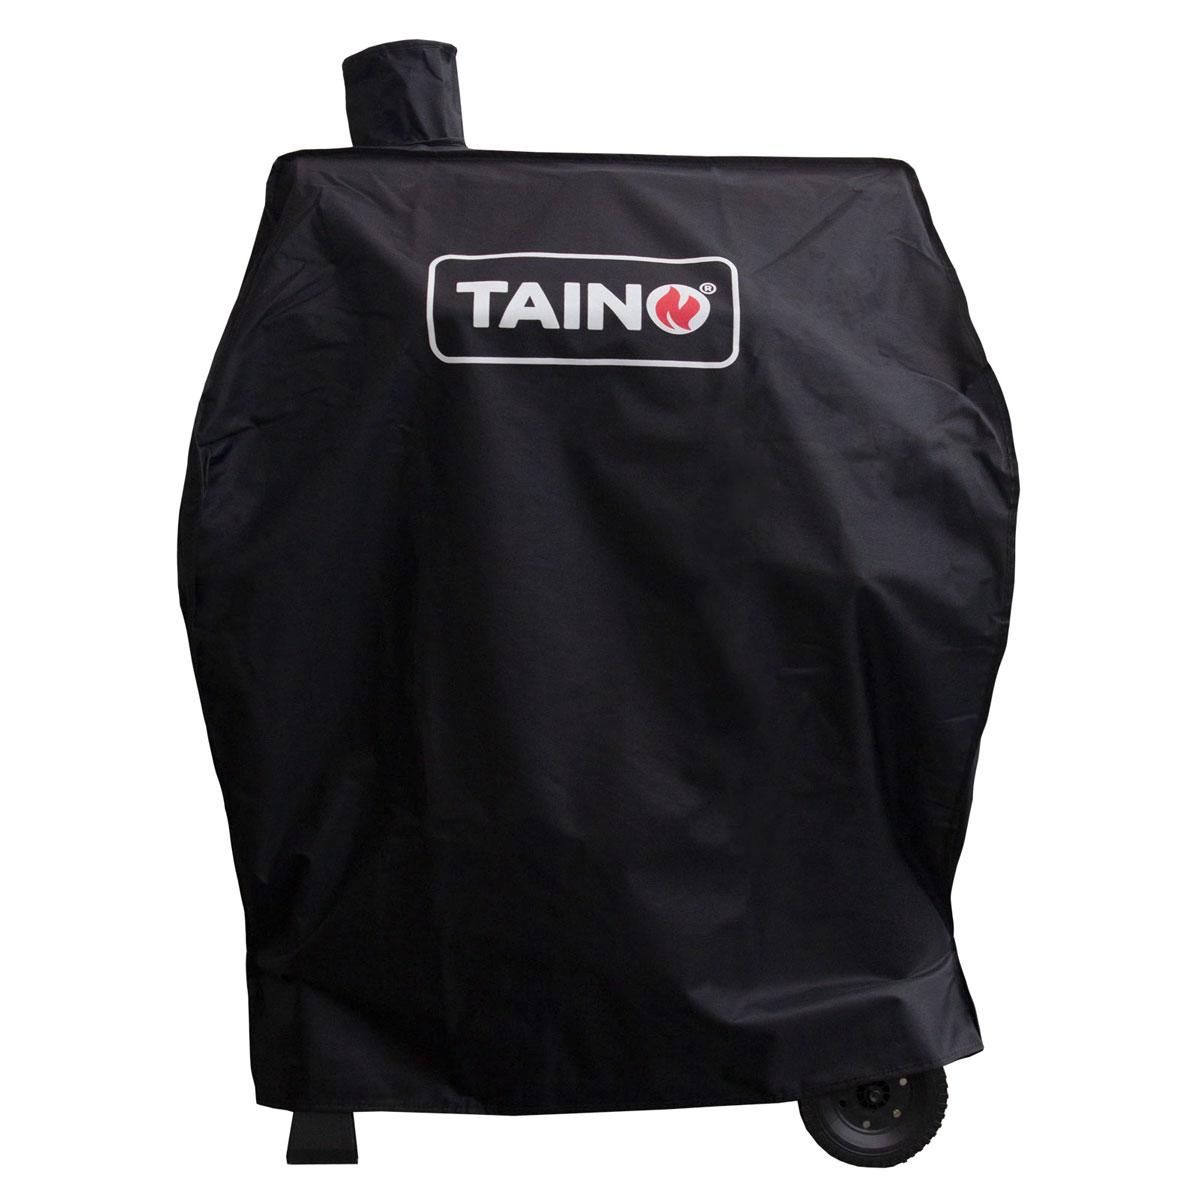 93538 Abdeckung TAINO HERO